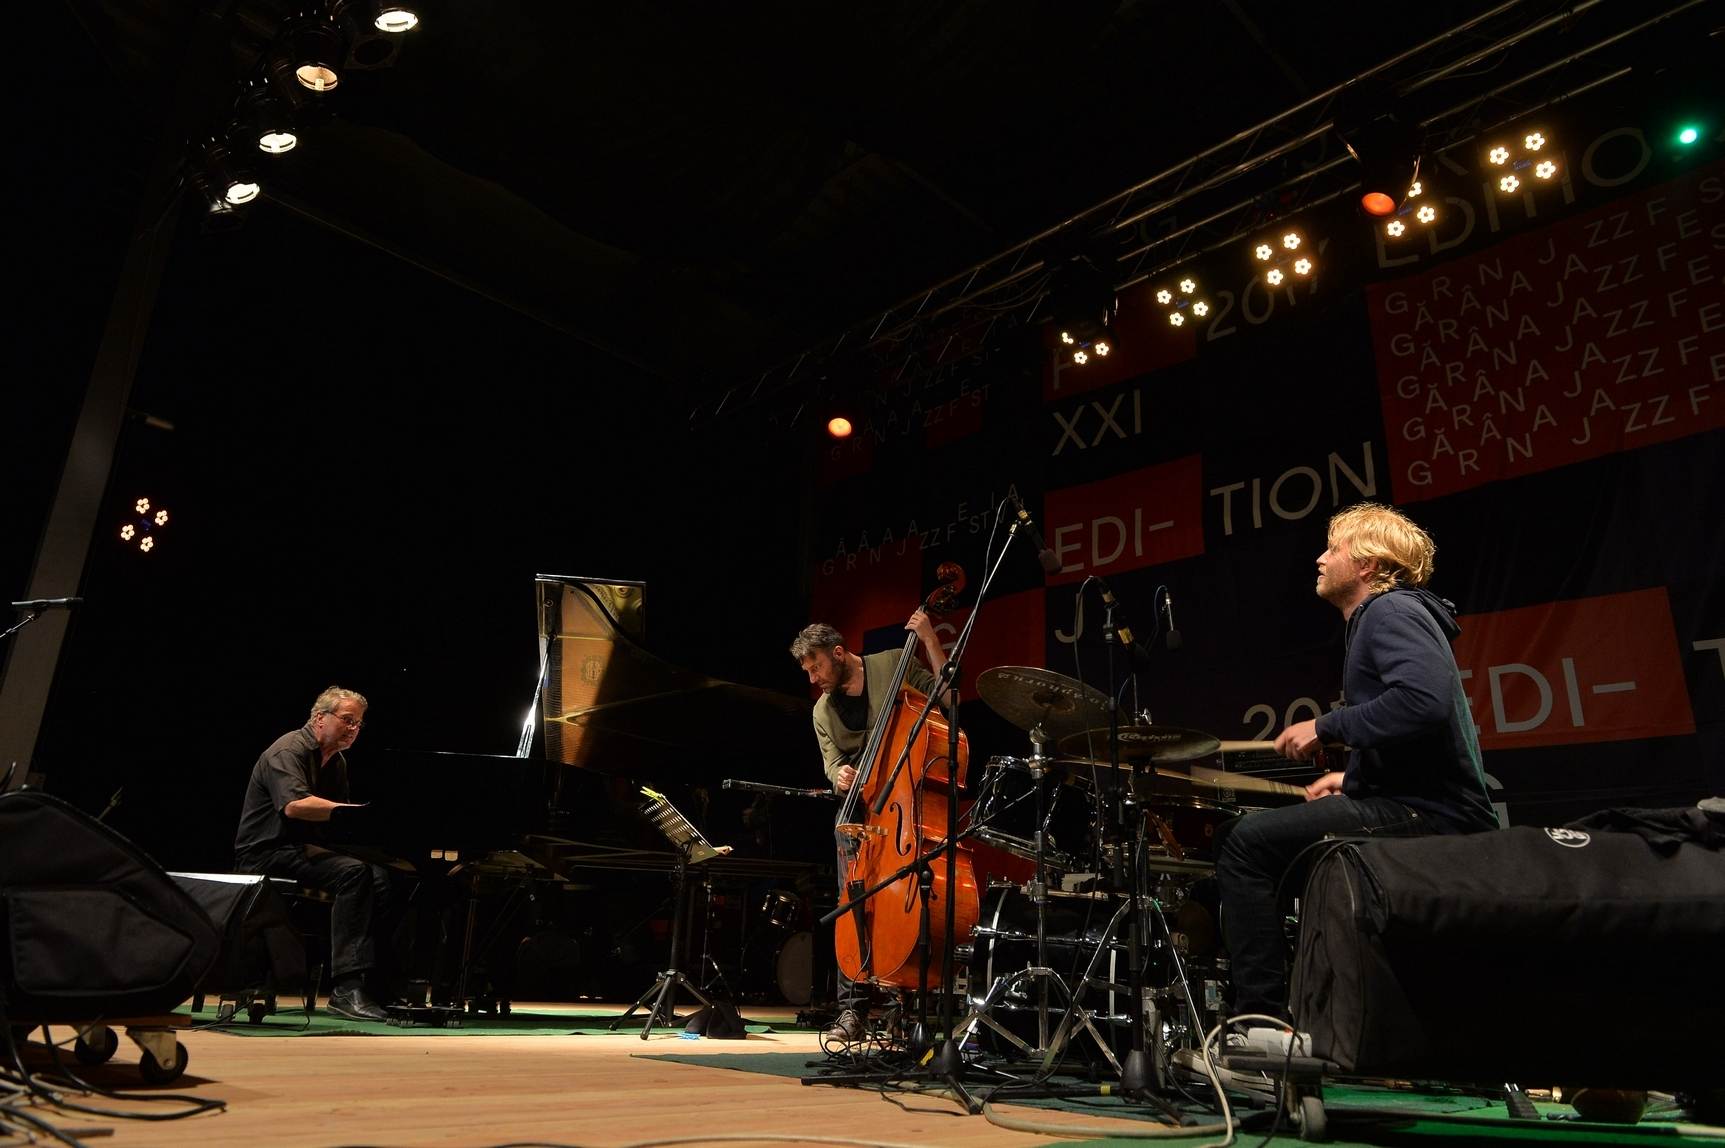 Bobo Stenson Trio at Garana Jazz Festival 2017